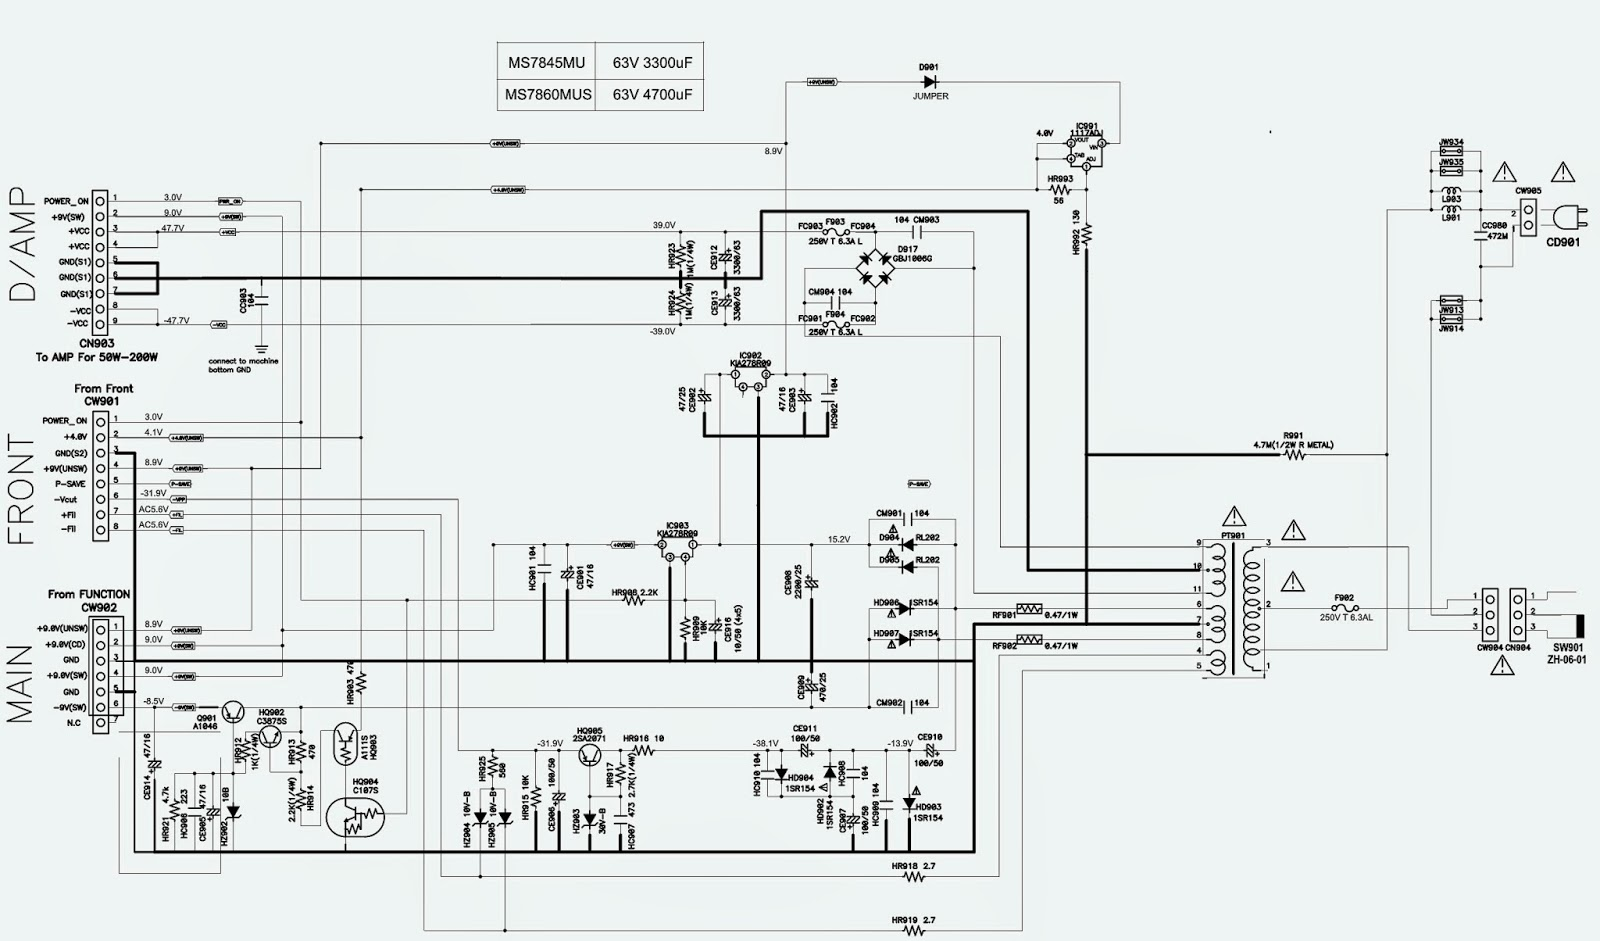 toshiba c20 wiring diagram contactor wiring diagram datasource [ 1600 x 941 Pixel ]